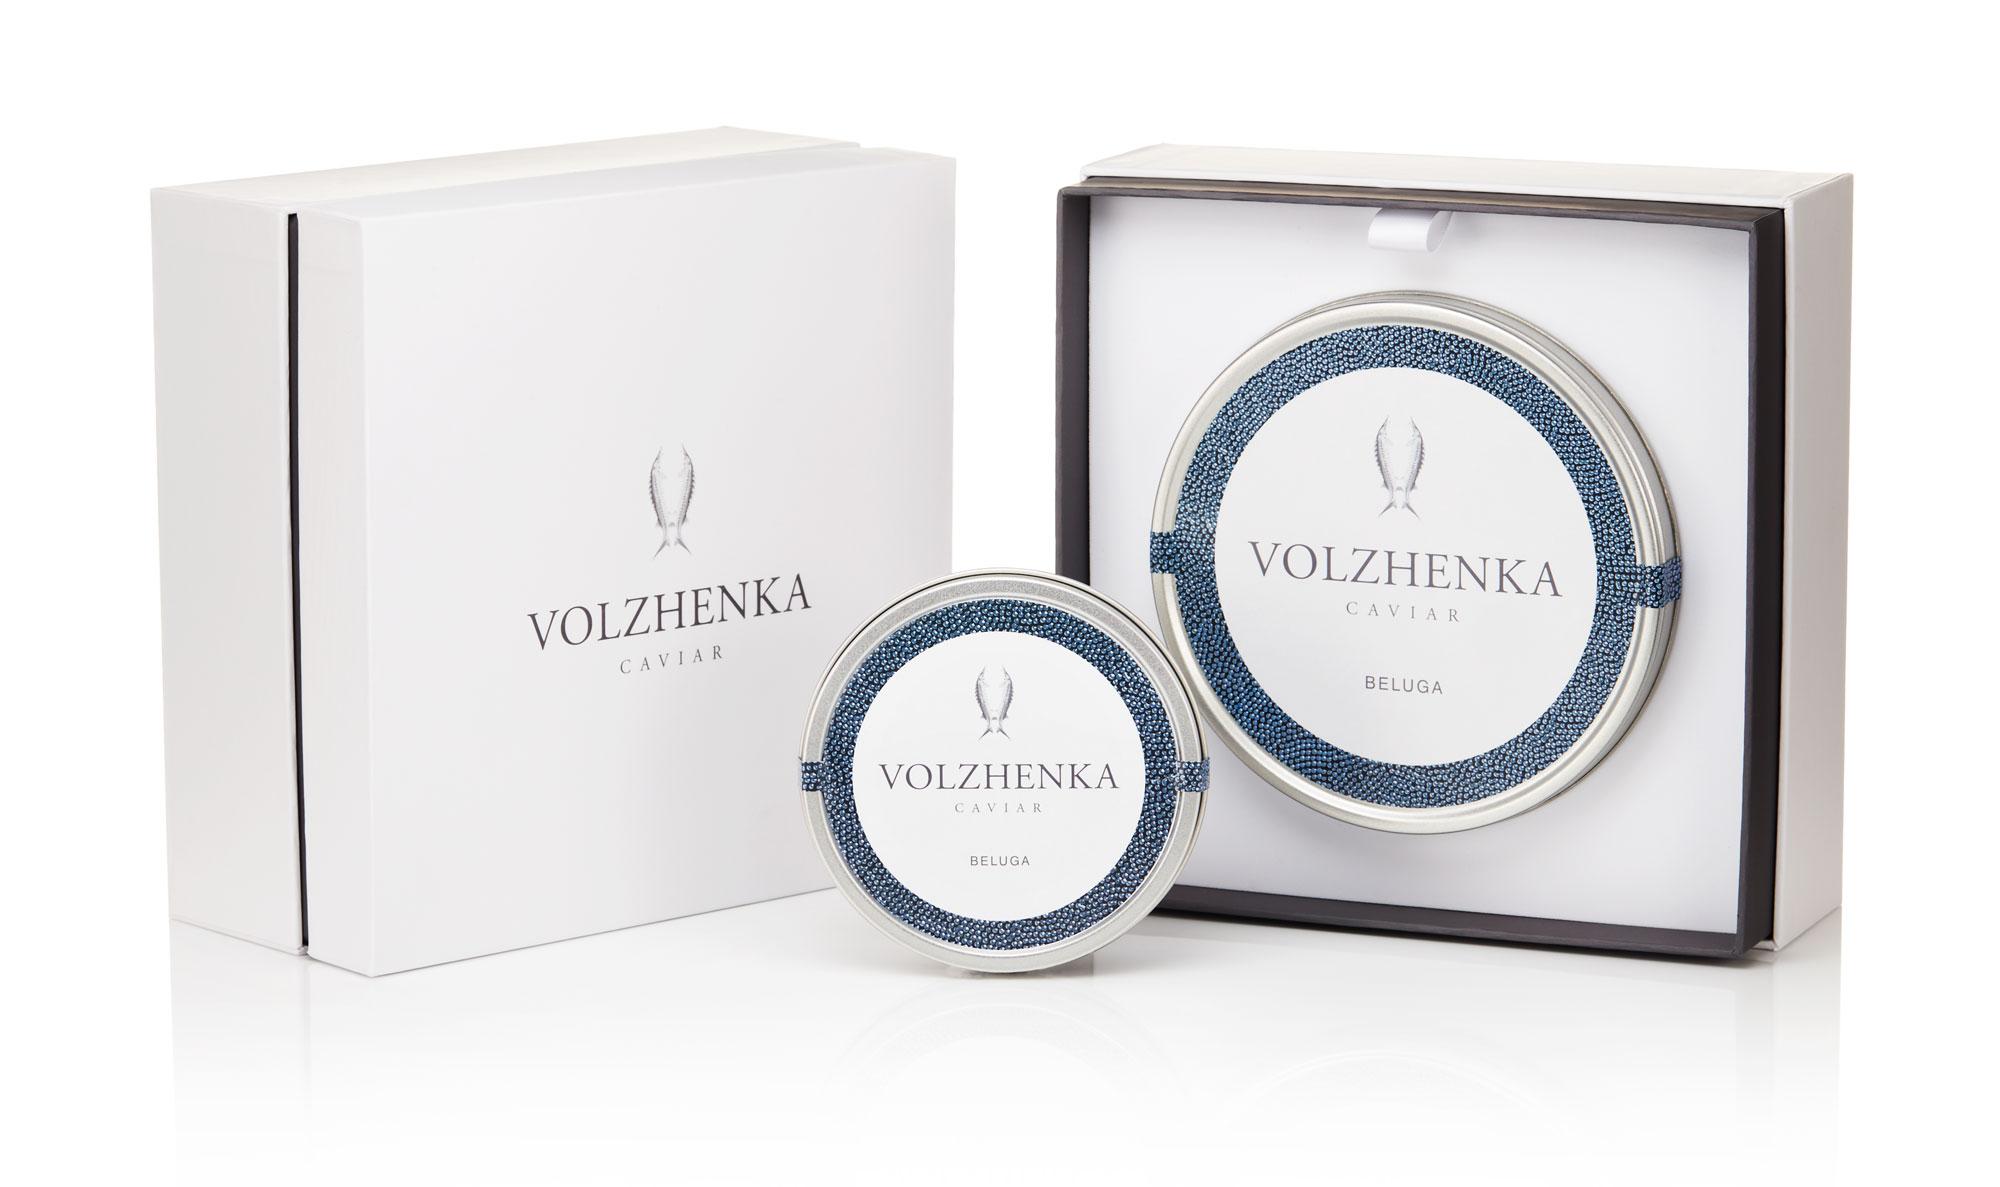 Volzhenka Caviar